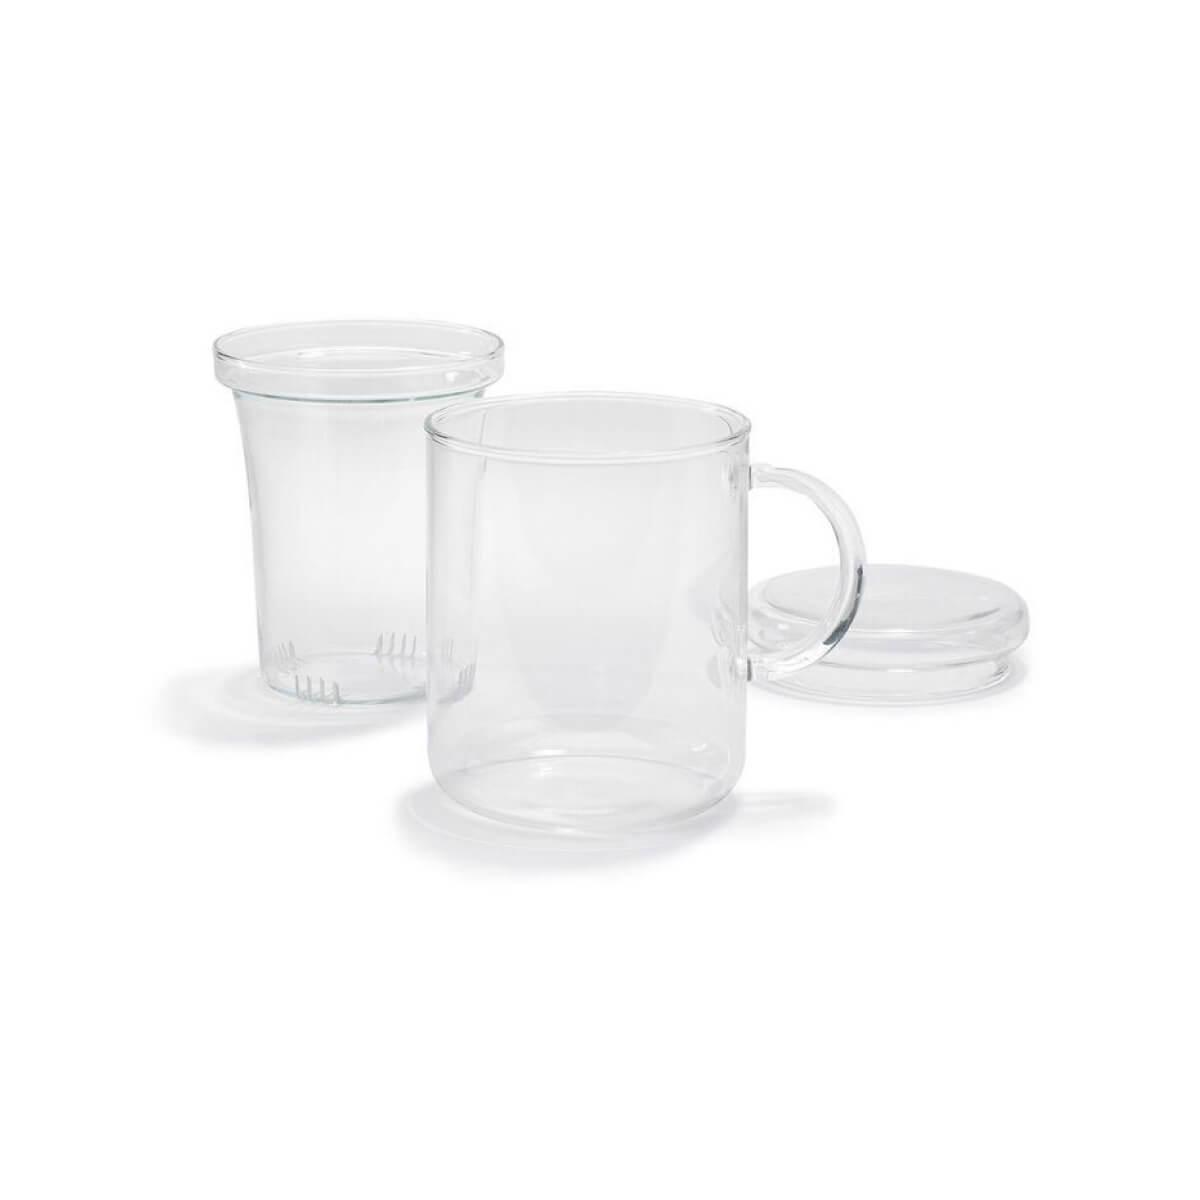 Trendglas JENA German Glass Tea Cup with Strainer